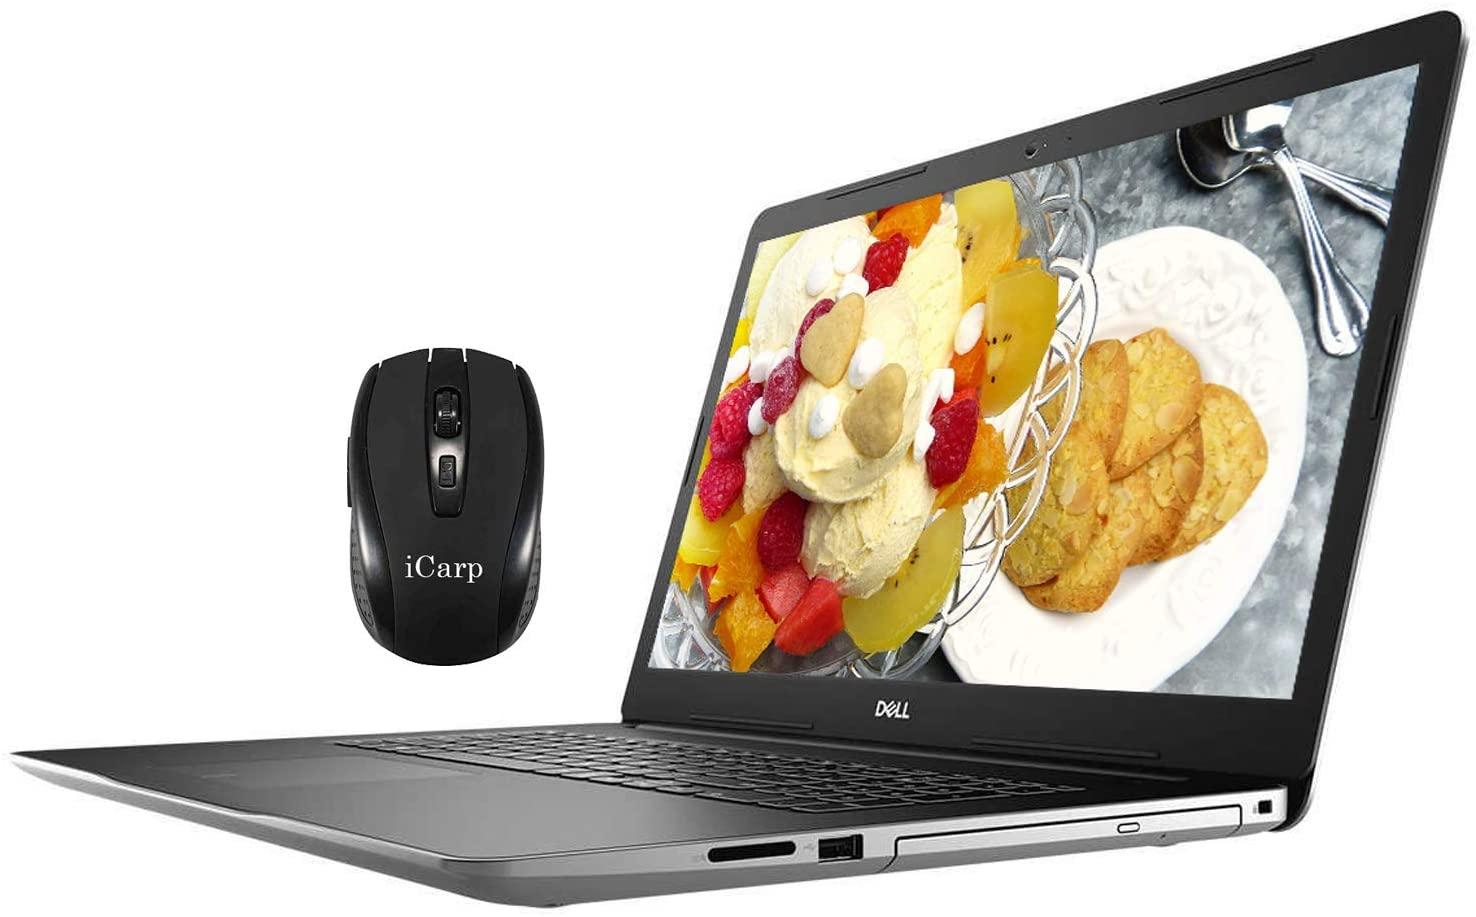 2020 Dell Inspiron 17 3793 Premium Business Laptop, 17.3